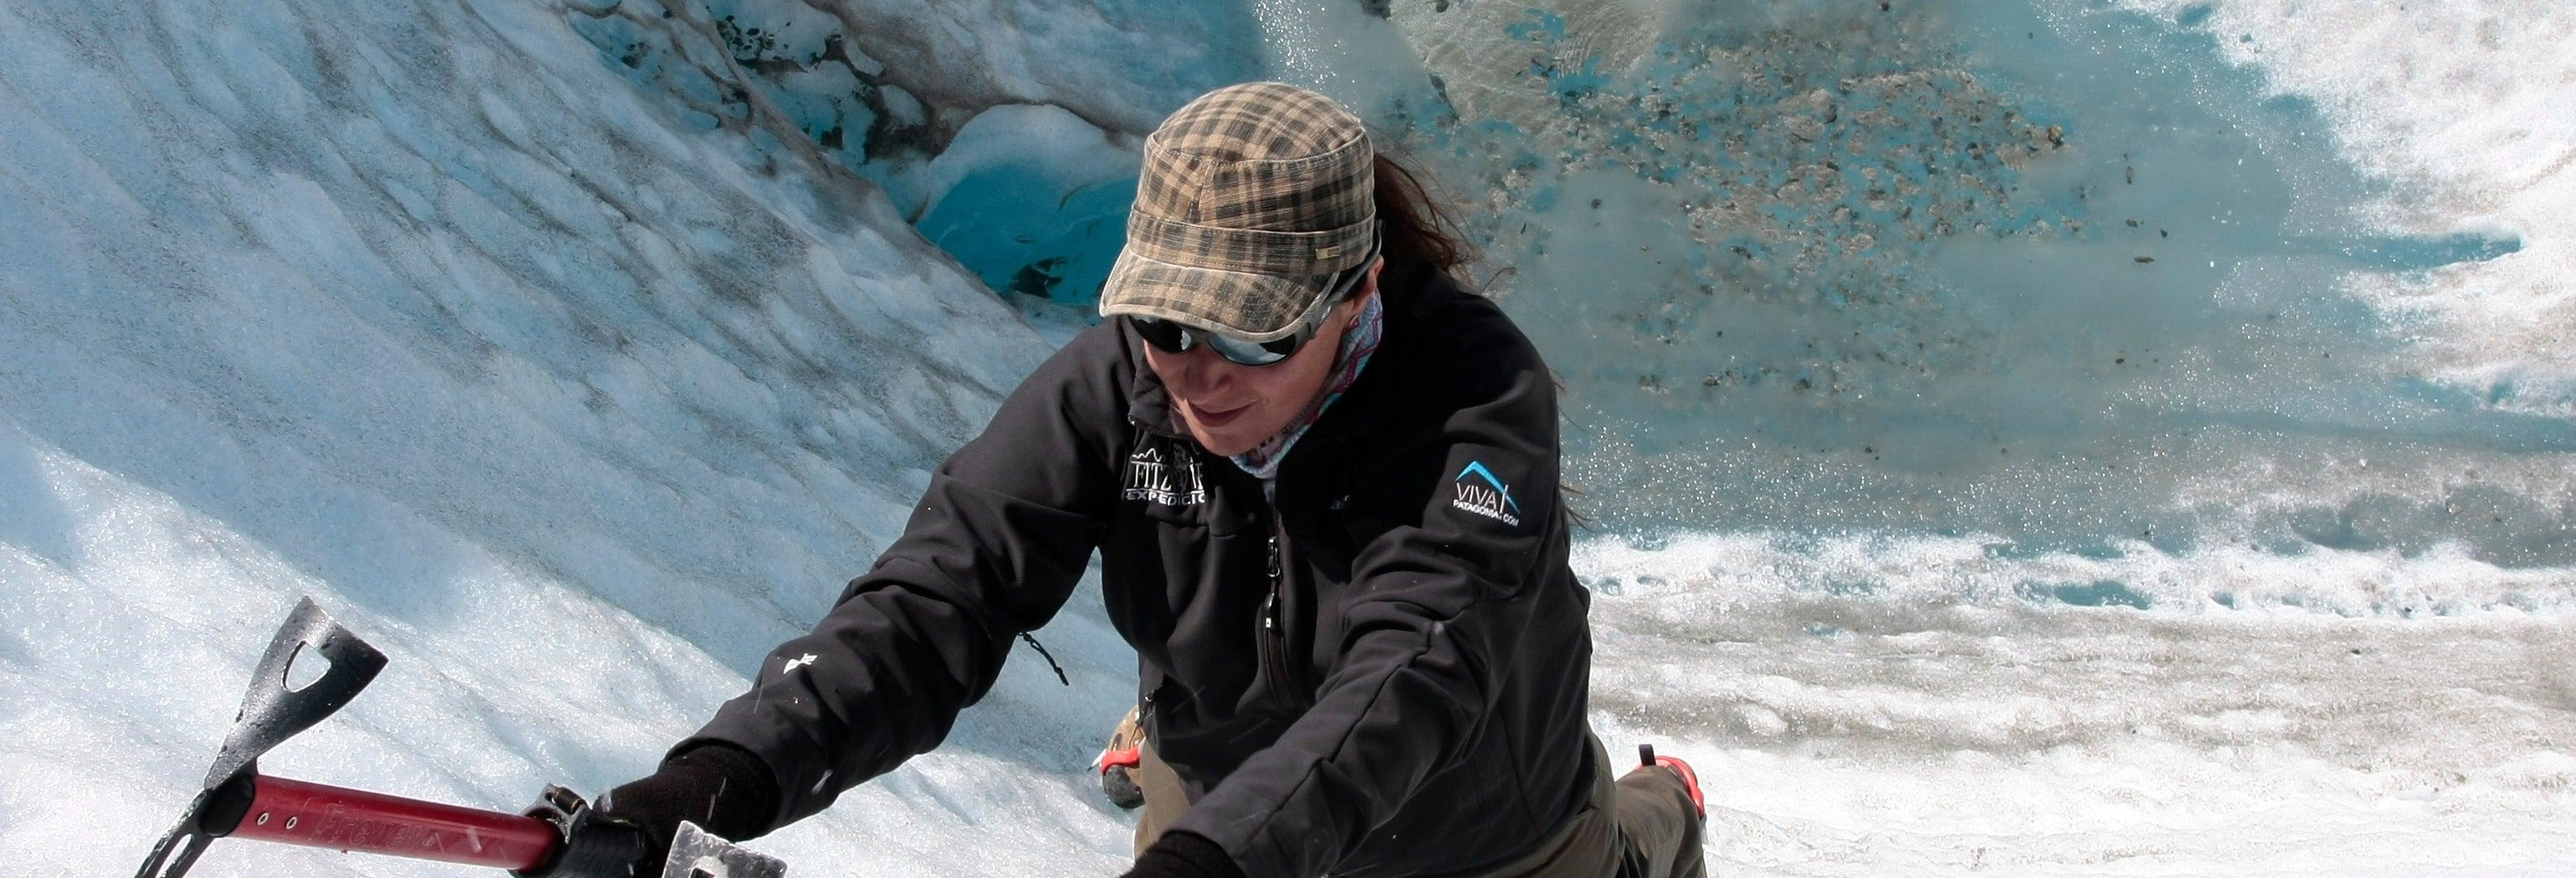 Curso privado de escalada no gelo de 2 ou 3 dias